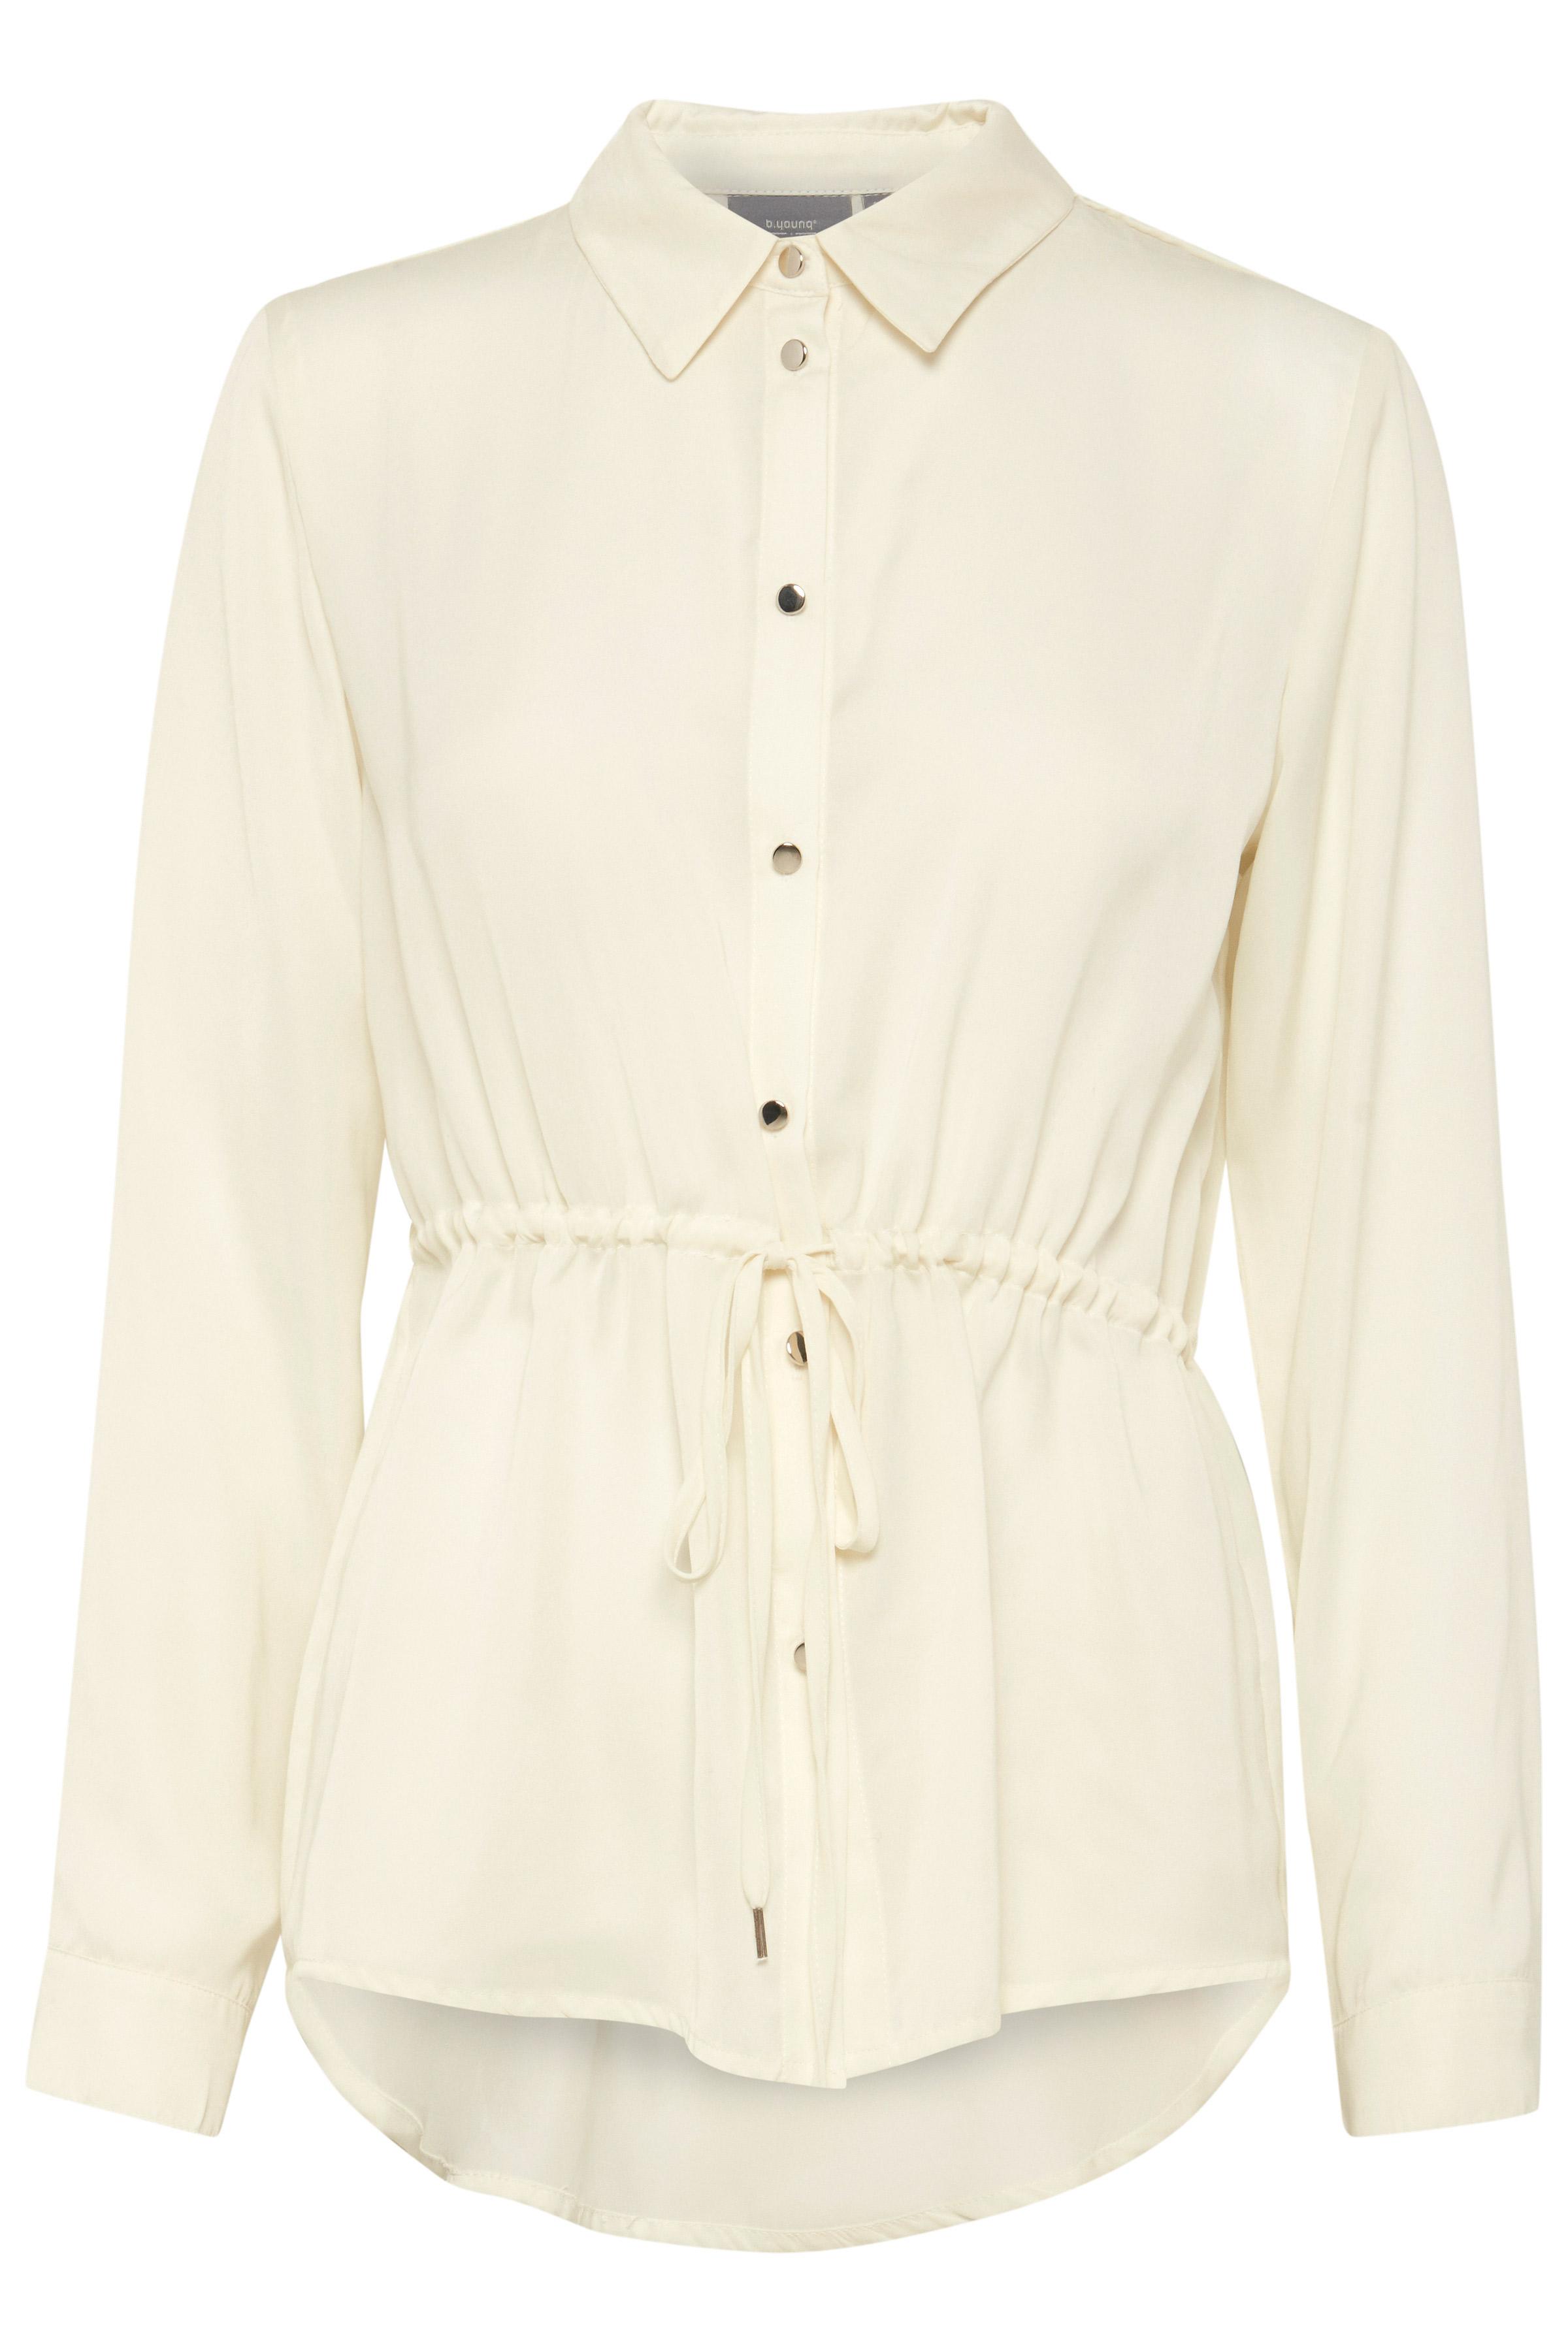 Image of b.young Dame Feminin Farcia skjortebluse - Off-white